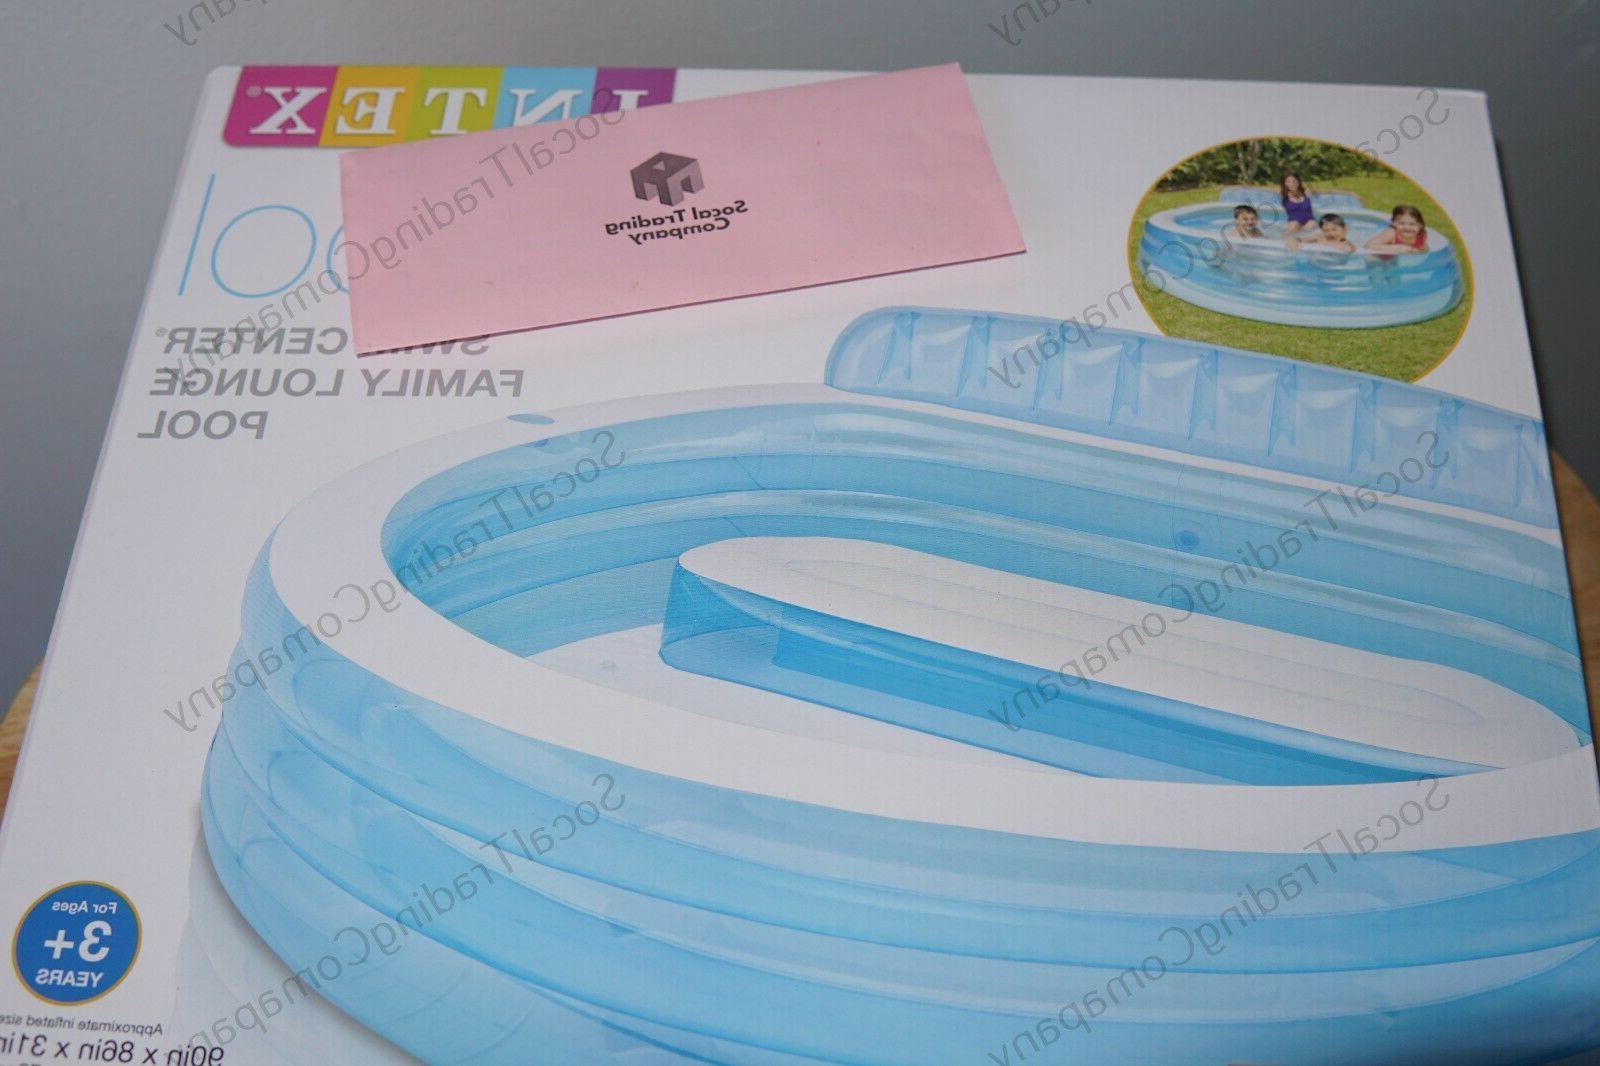 Intex Inflatable Lounge Pool Swim Center DAY✅